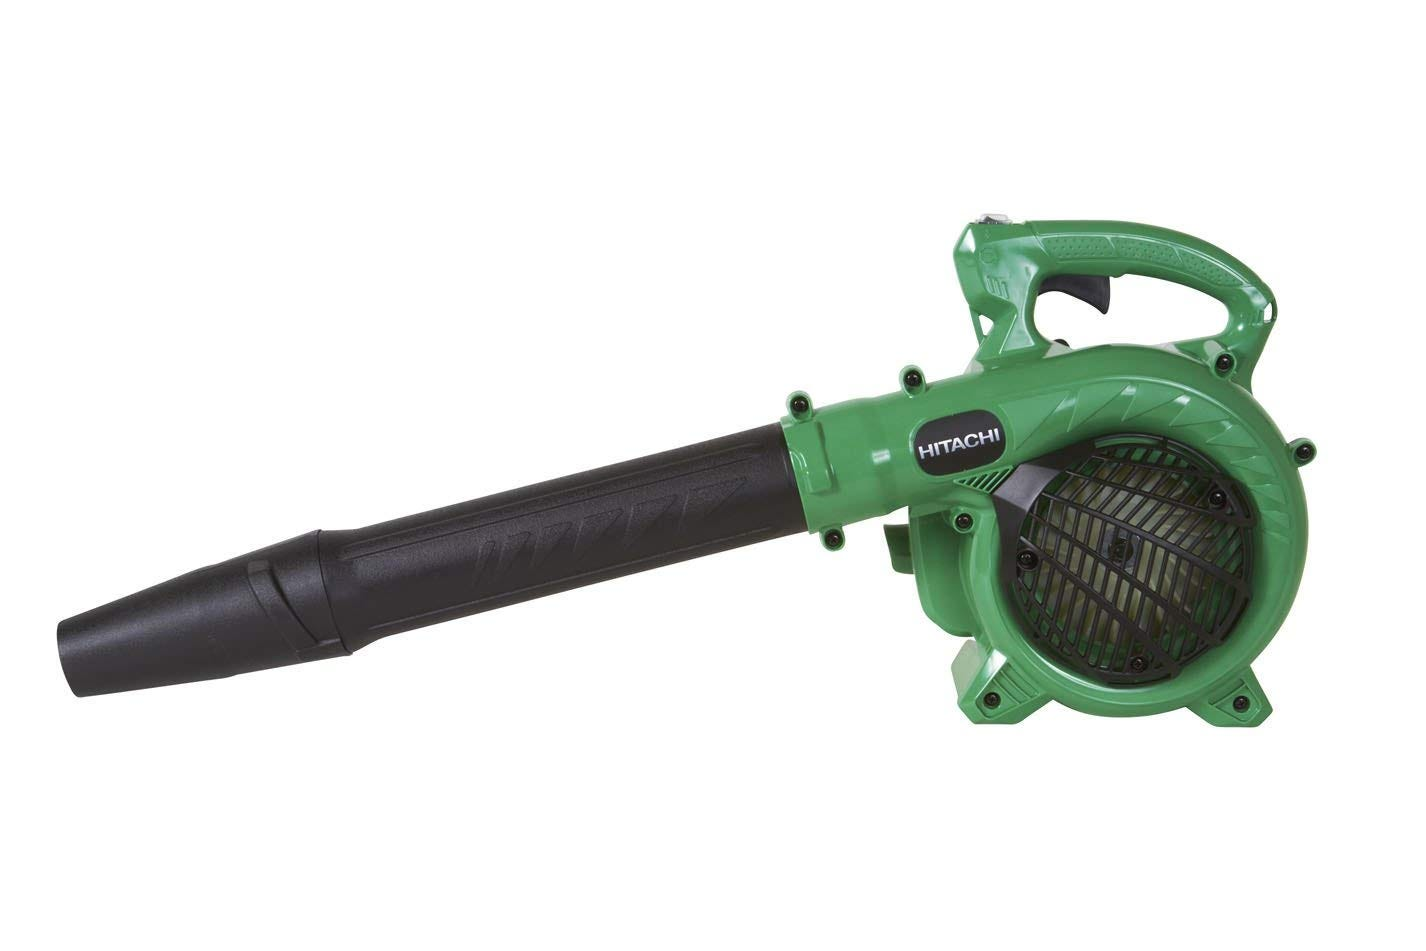 Hitachi RB24EAP leaf blower